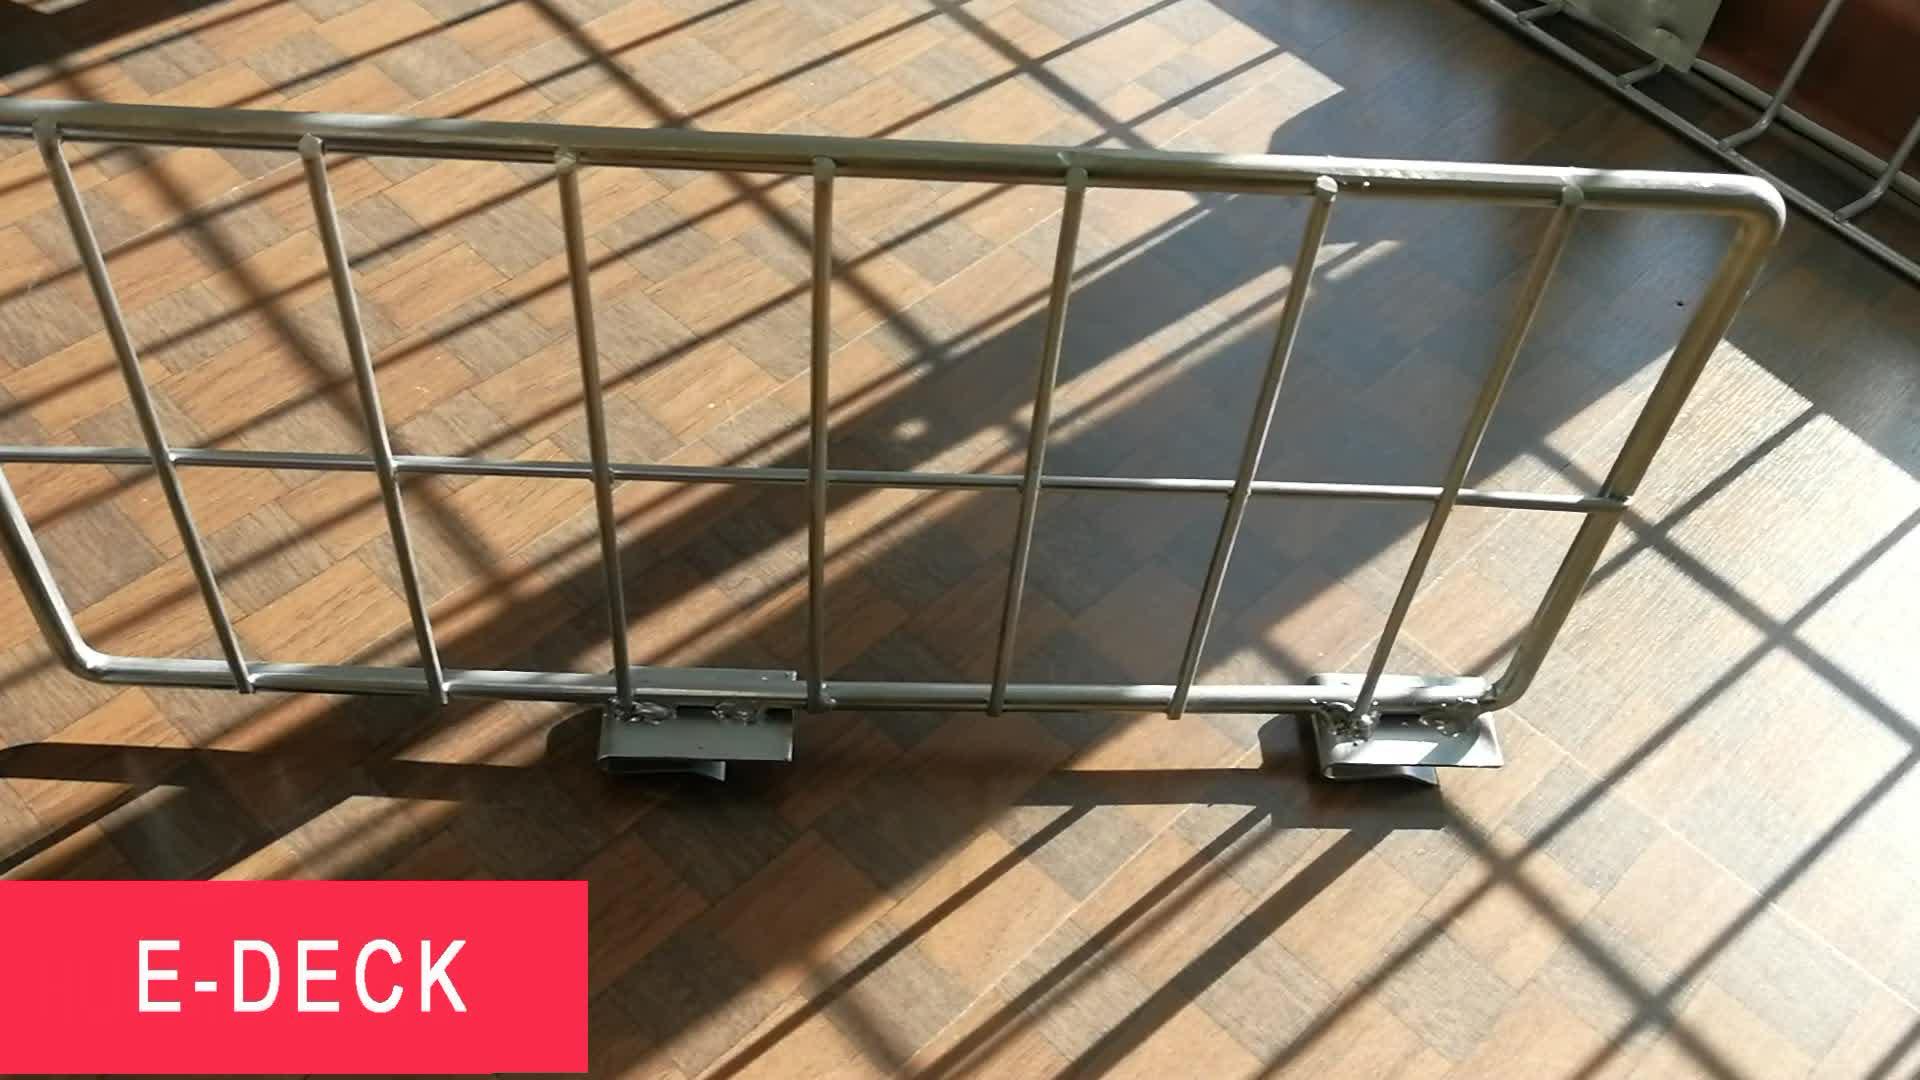 Özel depo ayakta clip-on snap-in palet raf metal çelik ızgara dikey tel raf bölücüler